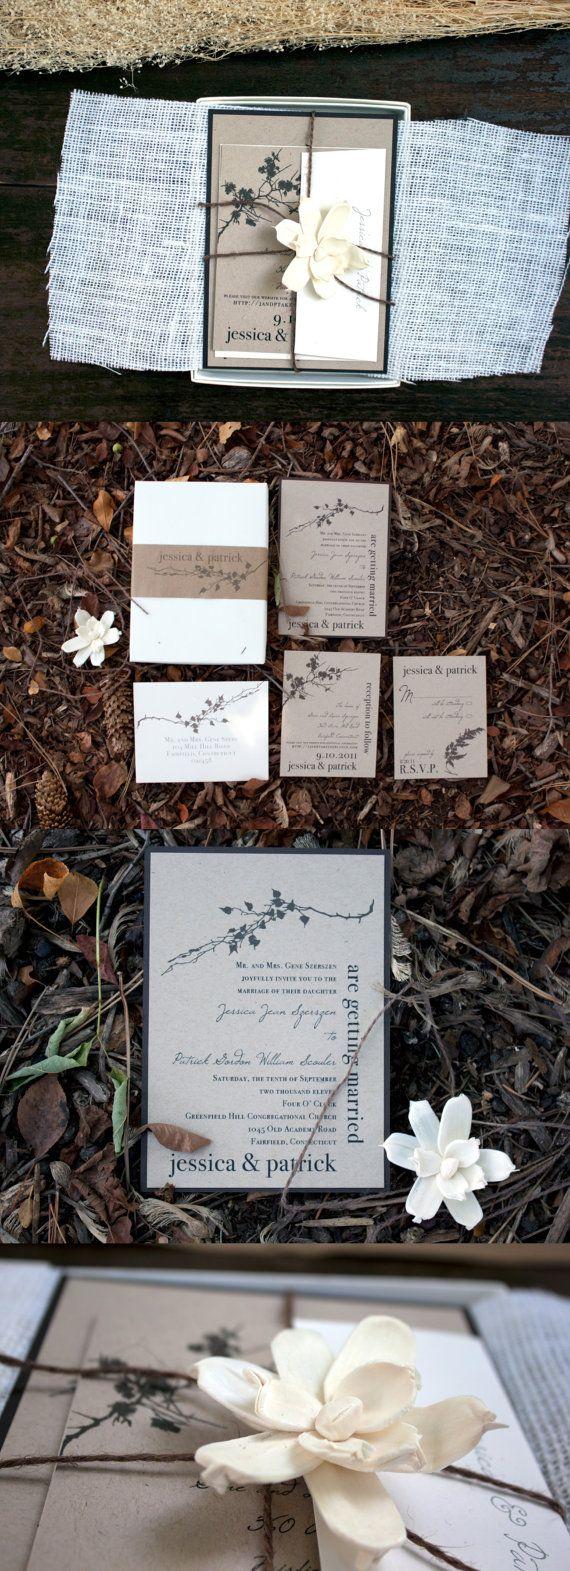 Ivory Romance Rustic Chic & Elegant Boxed Wedding by BeaconLane